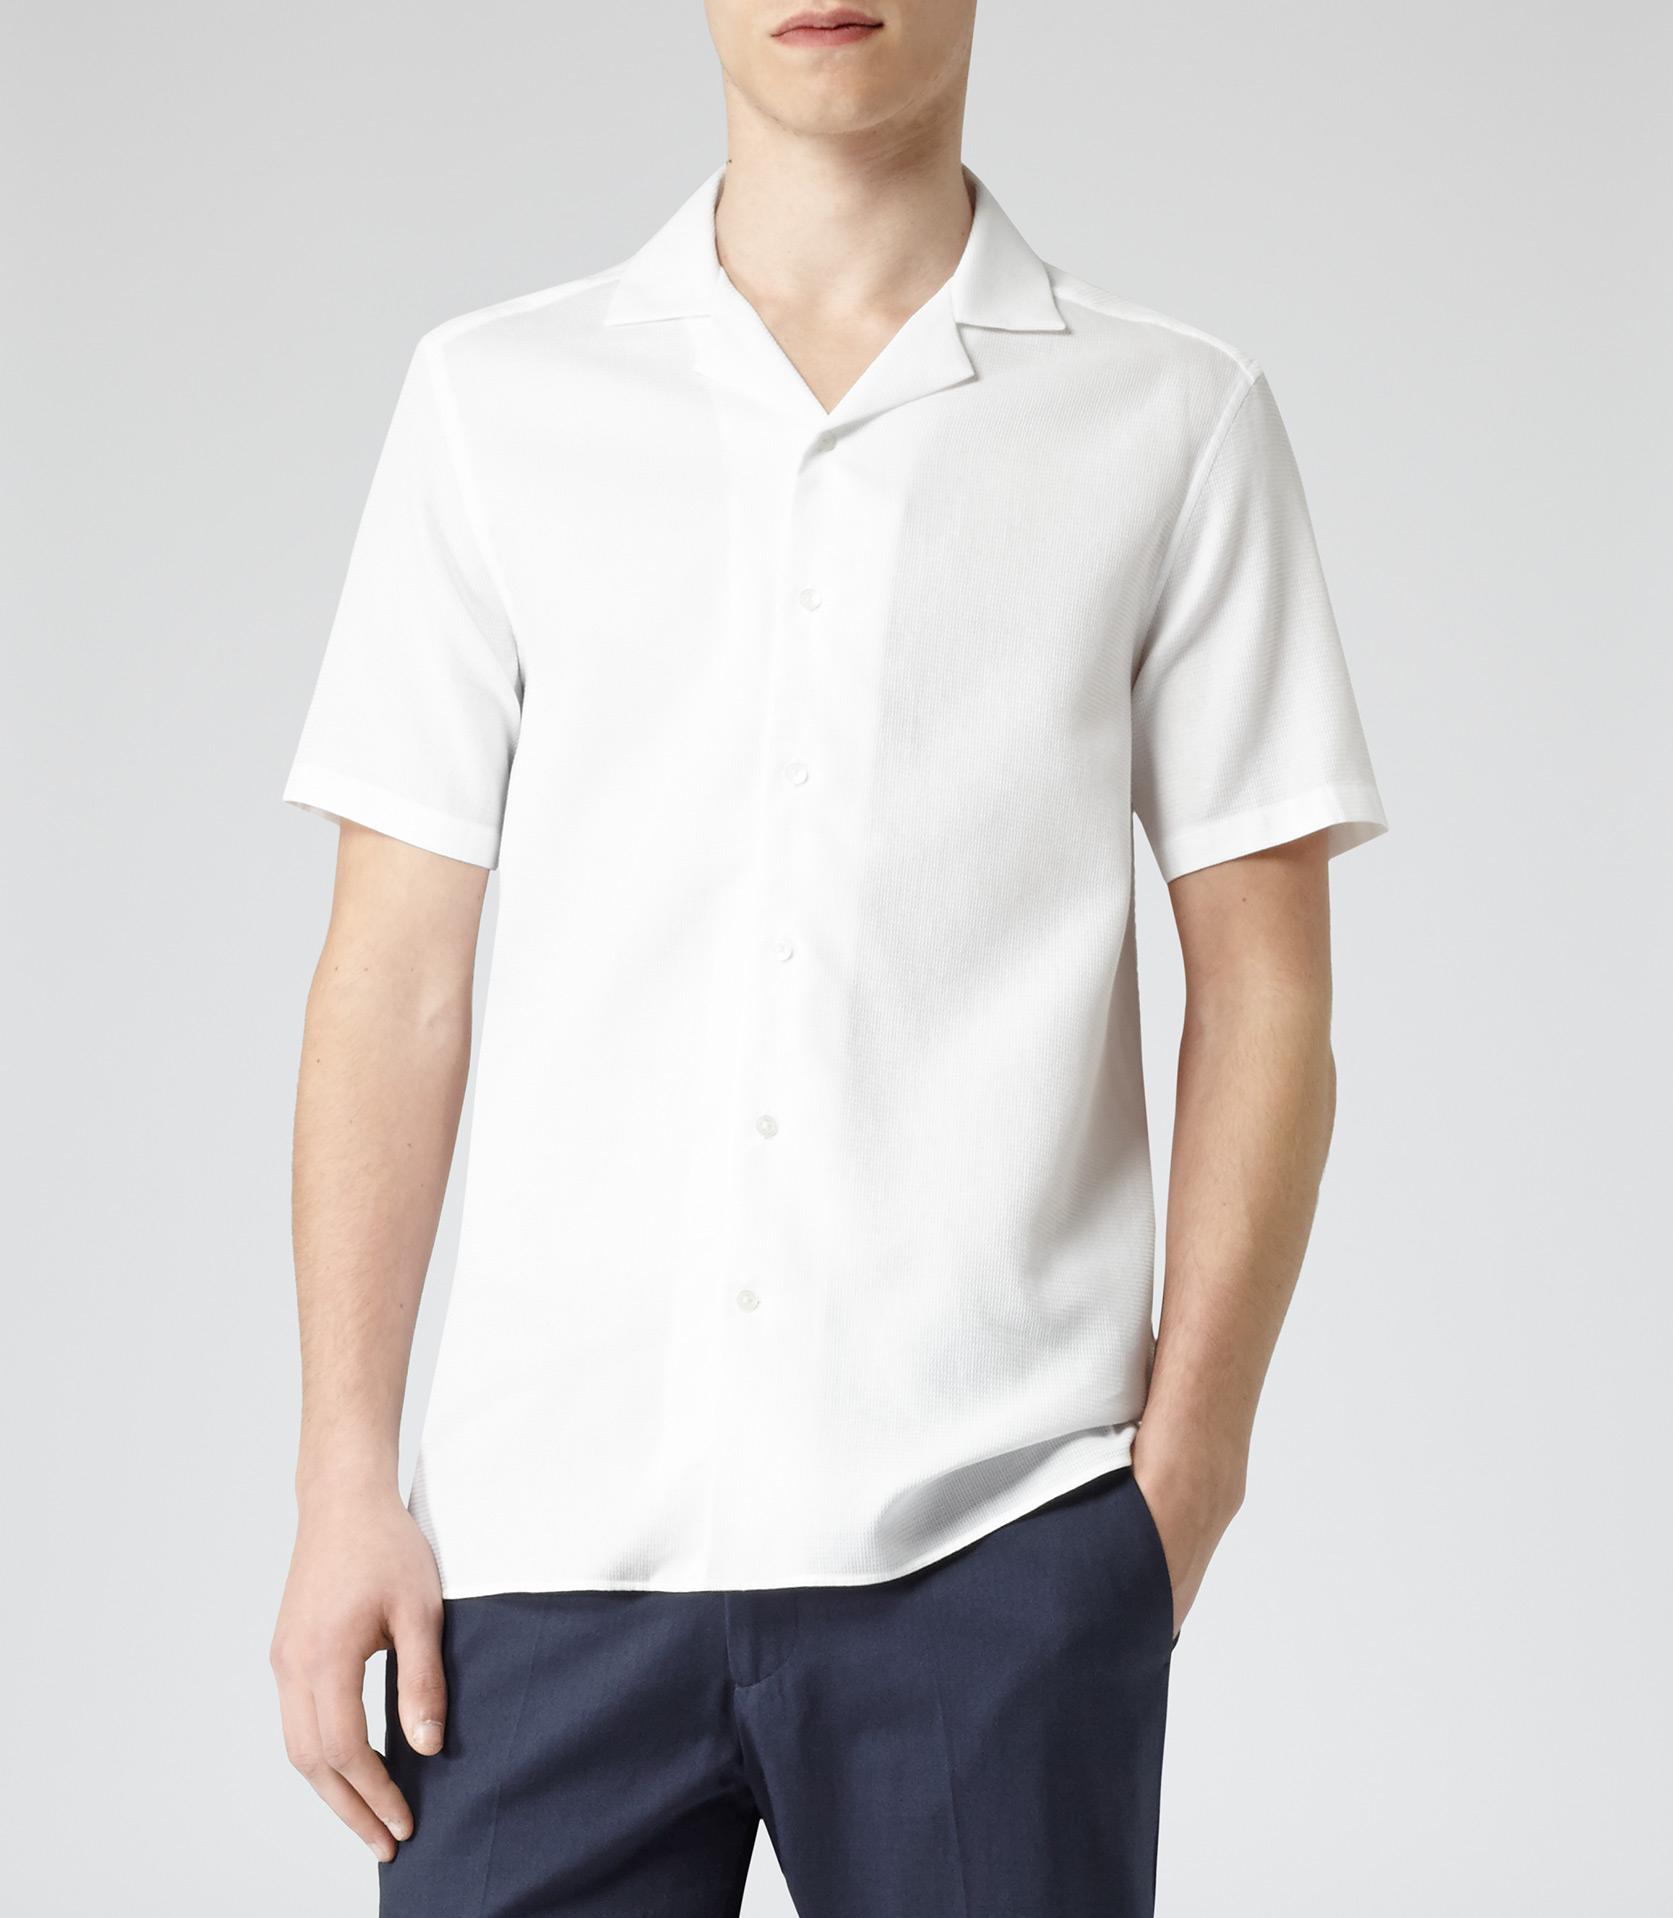 Lyst Reiss Alder Textured Cuban Collar Shirt In White